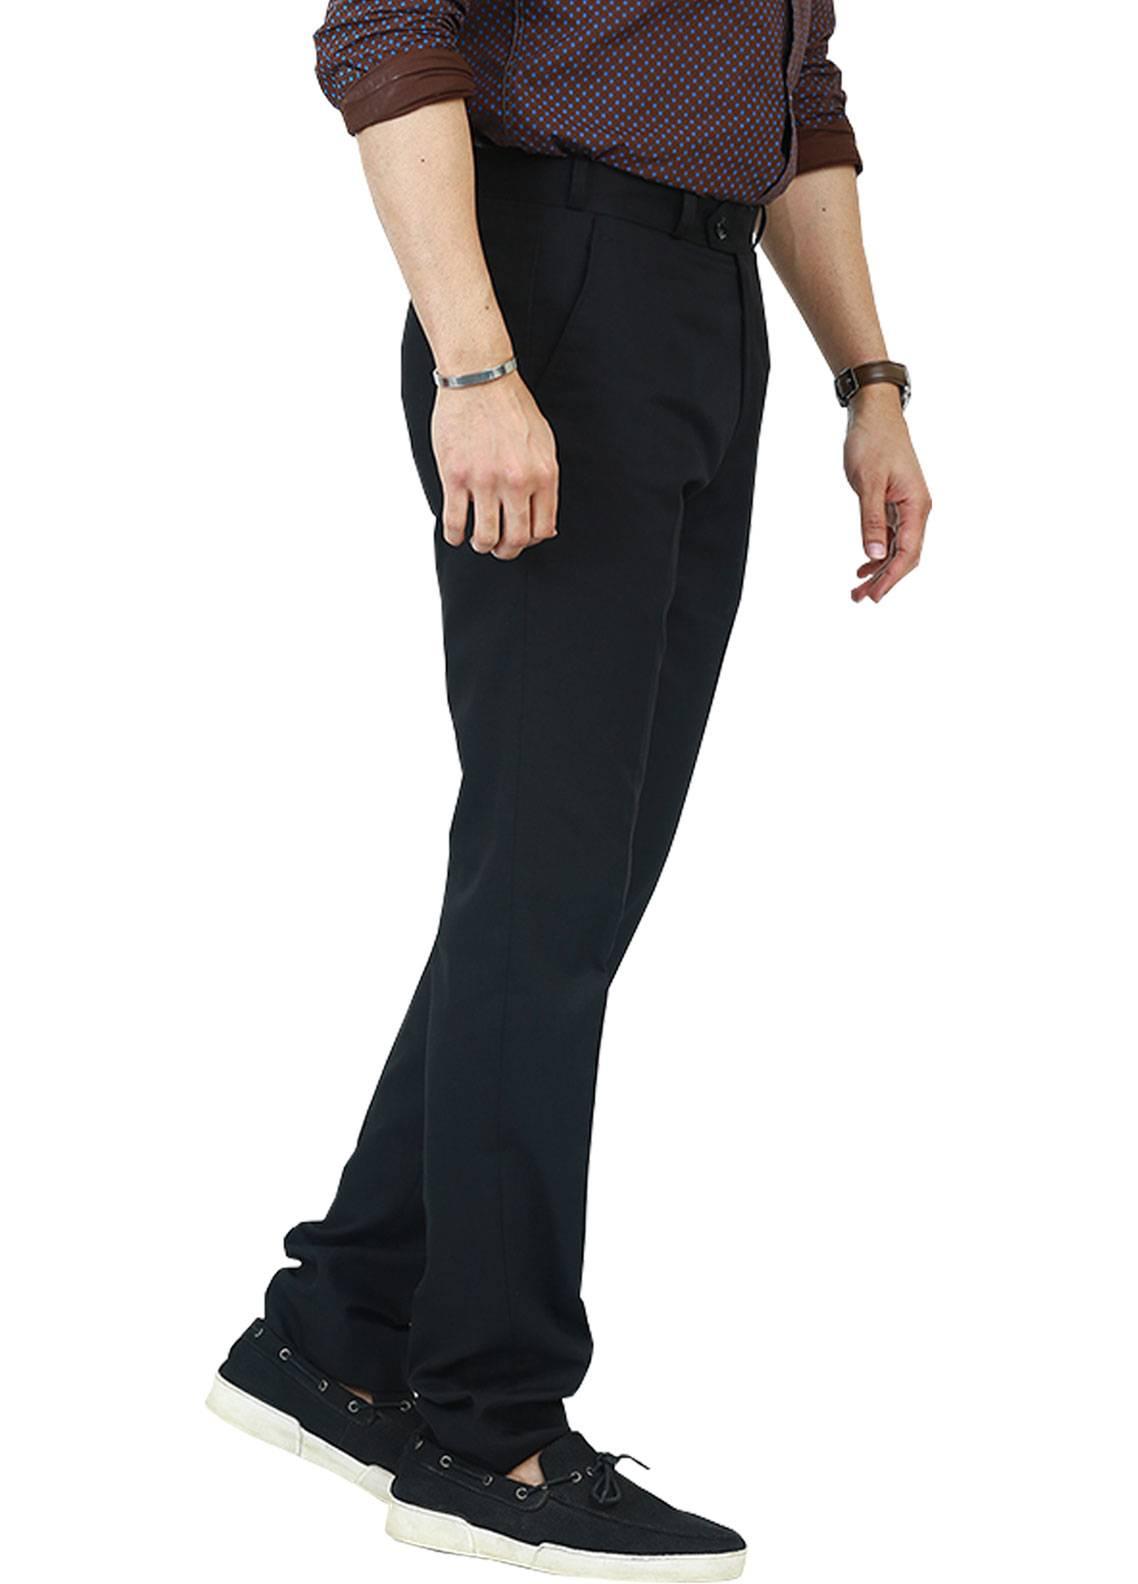 Shahzeb Saeed Wash N Wear Dress Trousers for Men - Black WTR-098